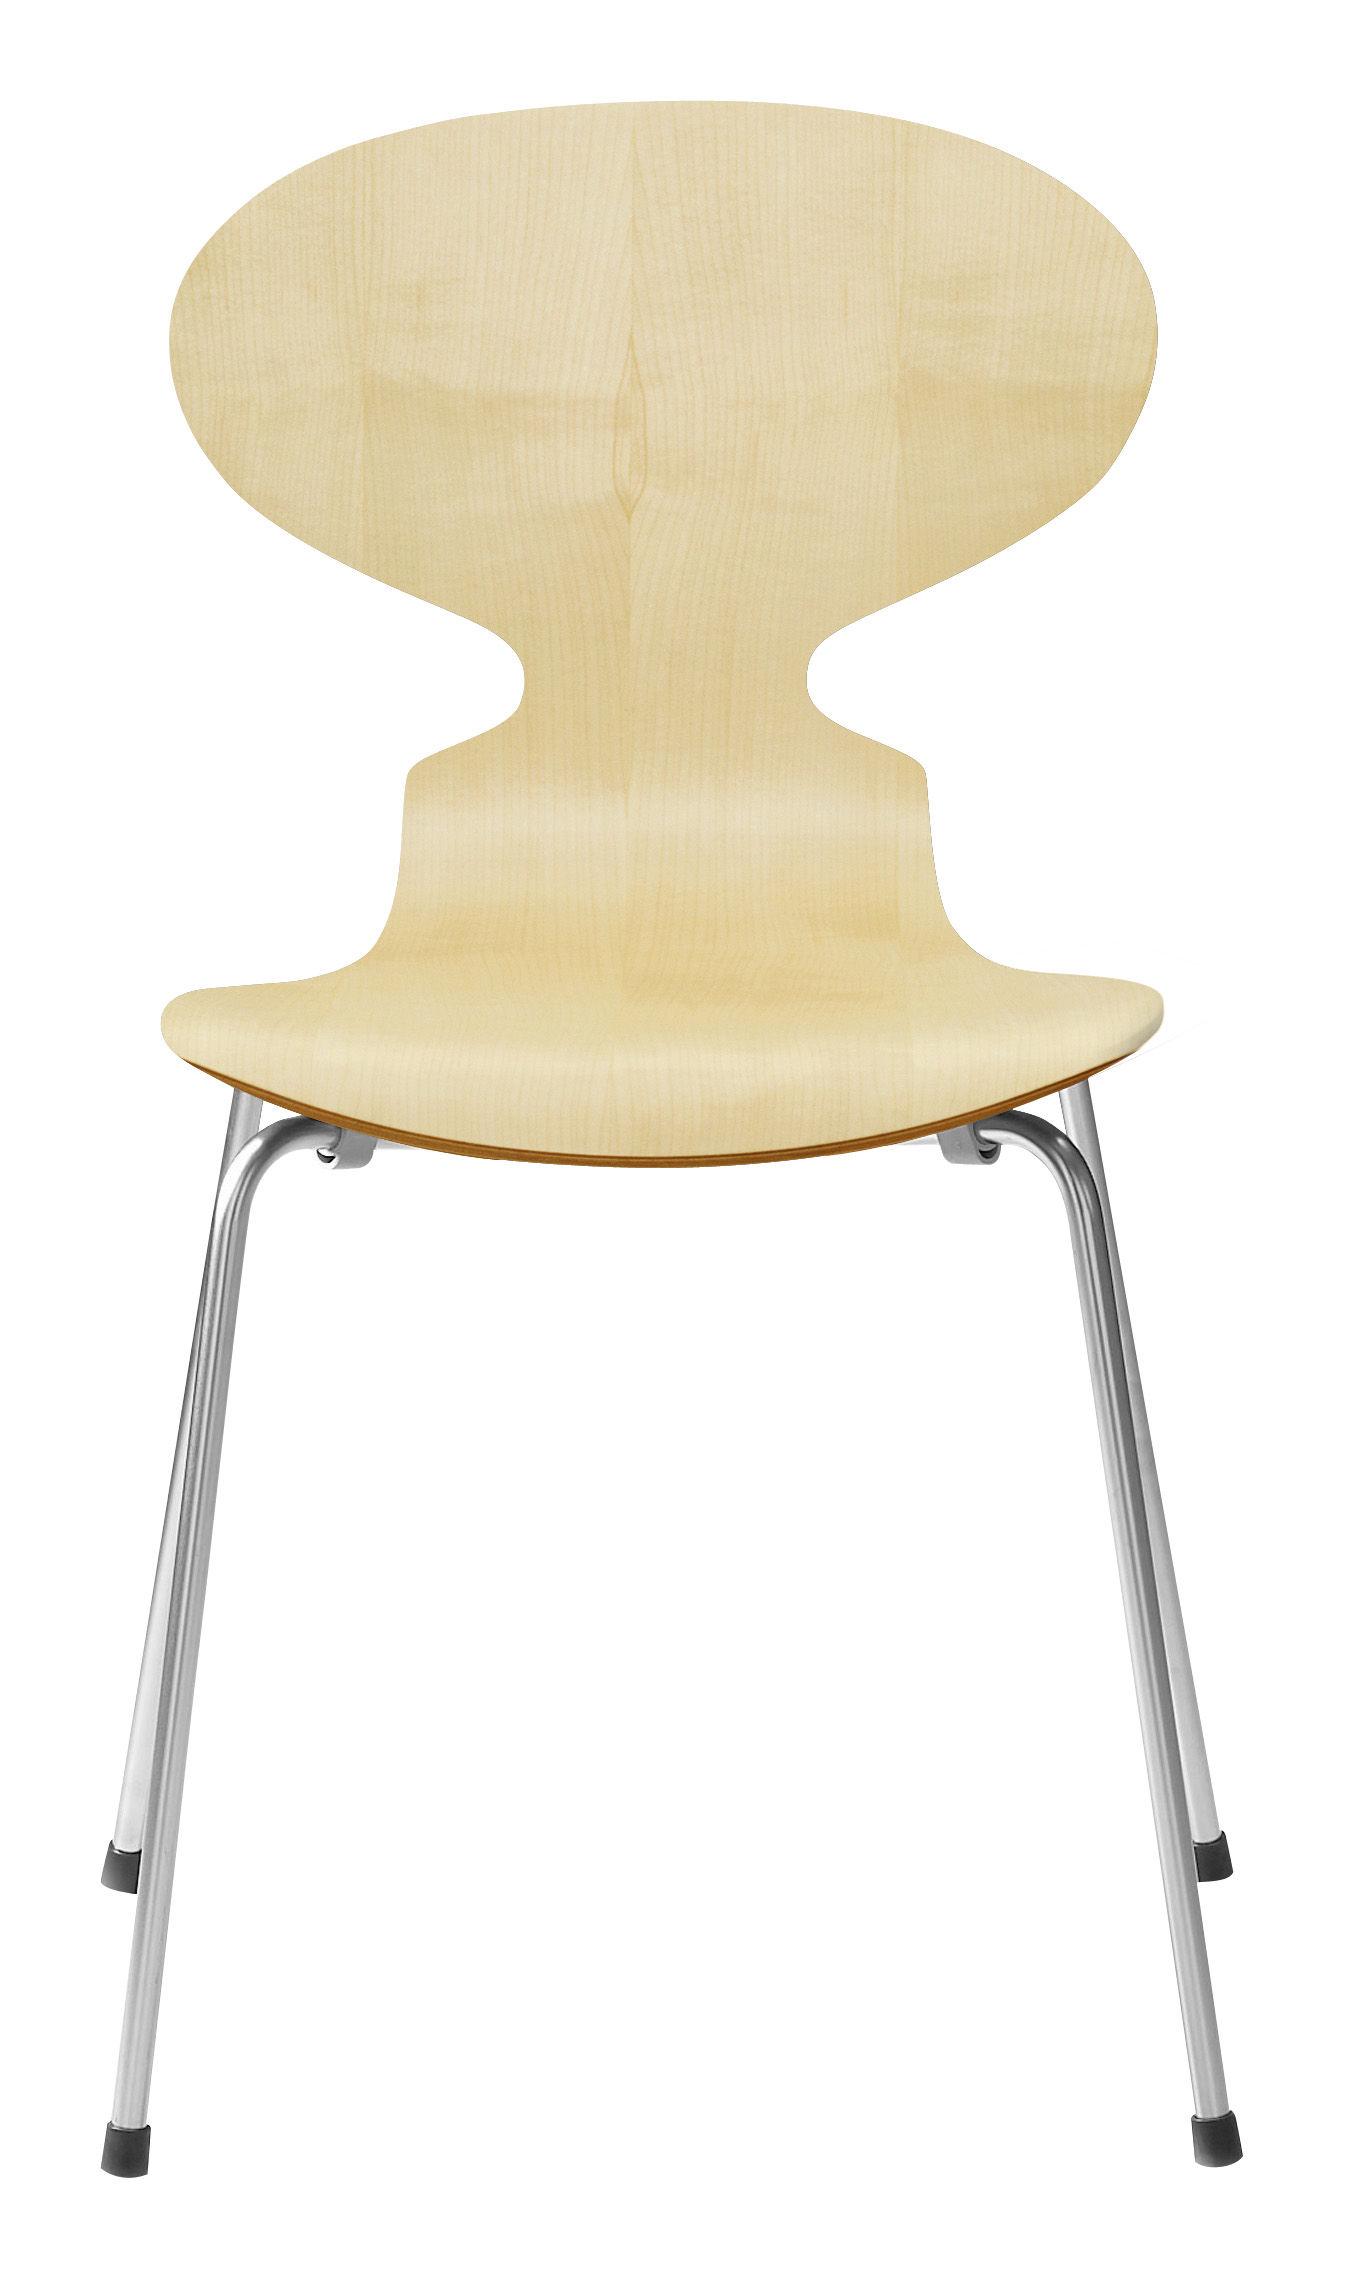 Möbel - Stühle  - Fourmi Stapelbarer Stuhl 4 Füße - Holz natur - Fritz Hansen - Ahorn - Contreplaqué d'érable verni, Stahl